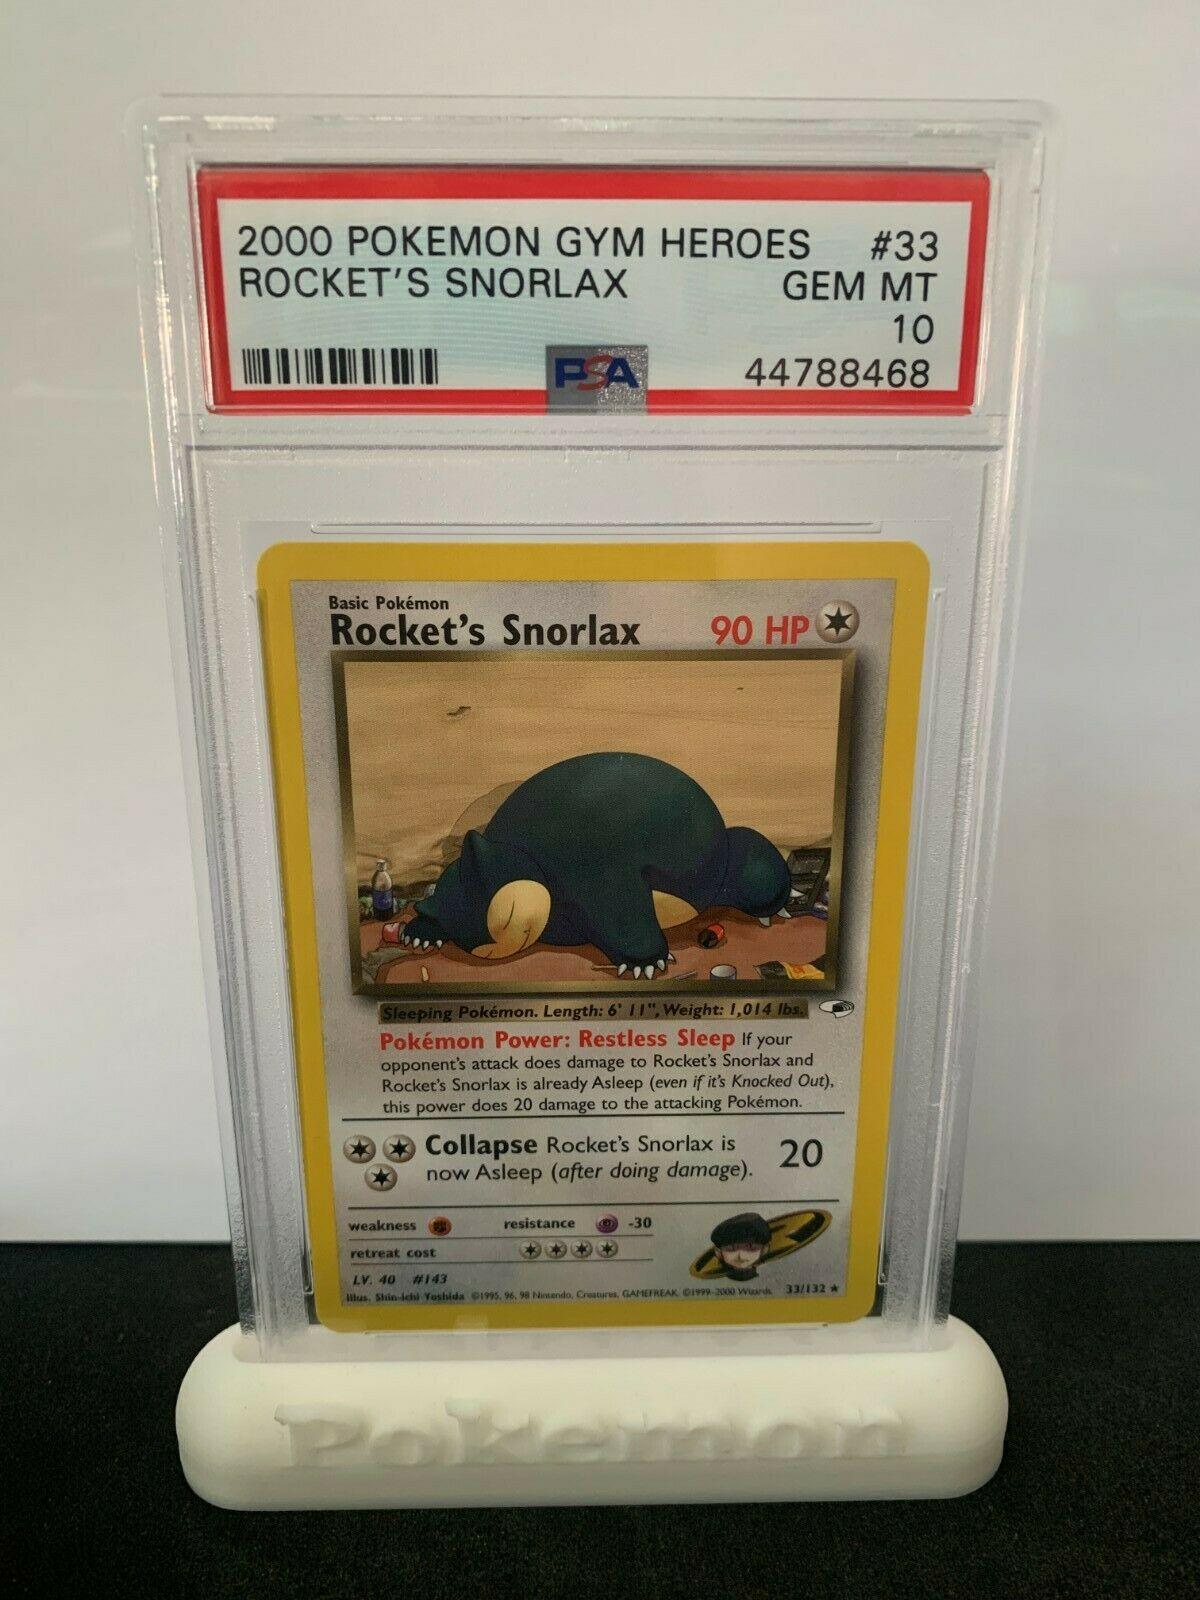 Pokemon PSA 10 Gym Heroes Rockets Snorlax non Holo Rare Mint 33